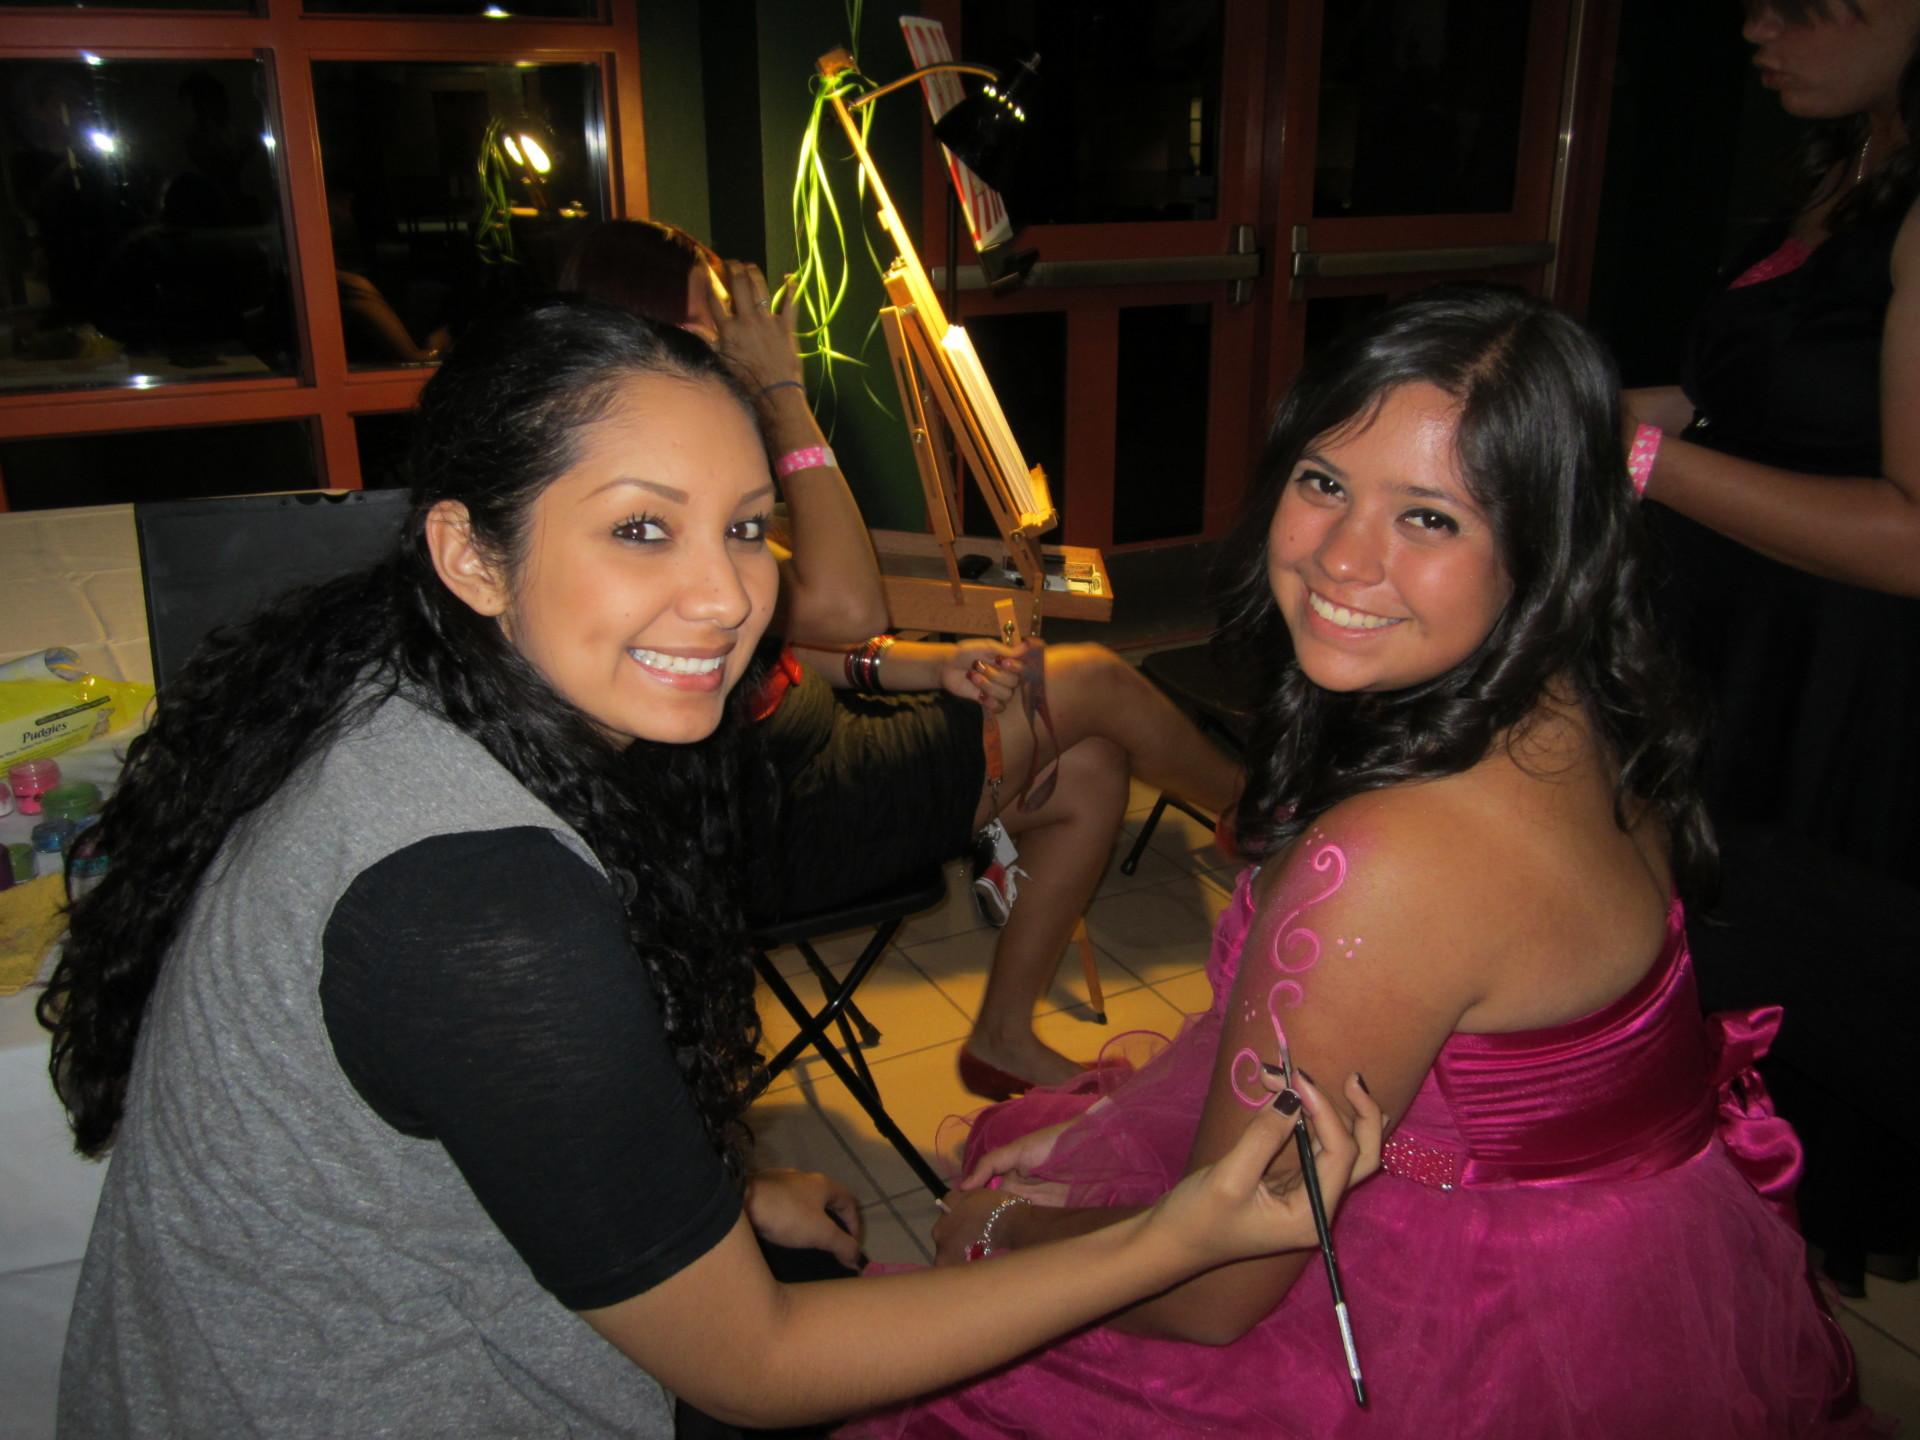 birthdays, parties, events, fiesta, cumpleanos, celebration, body, body art, body paint, special events